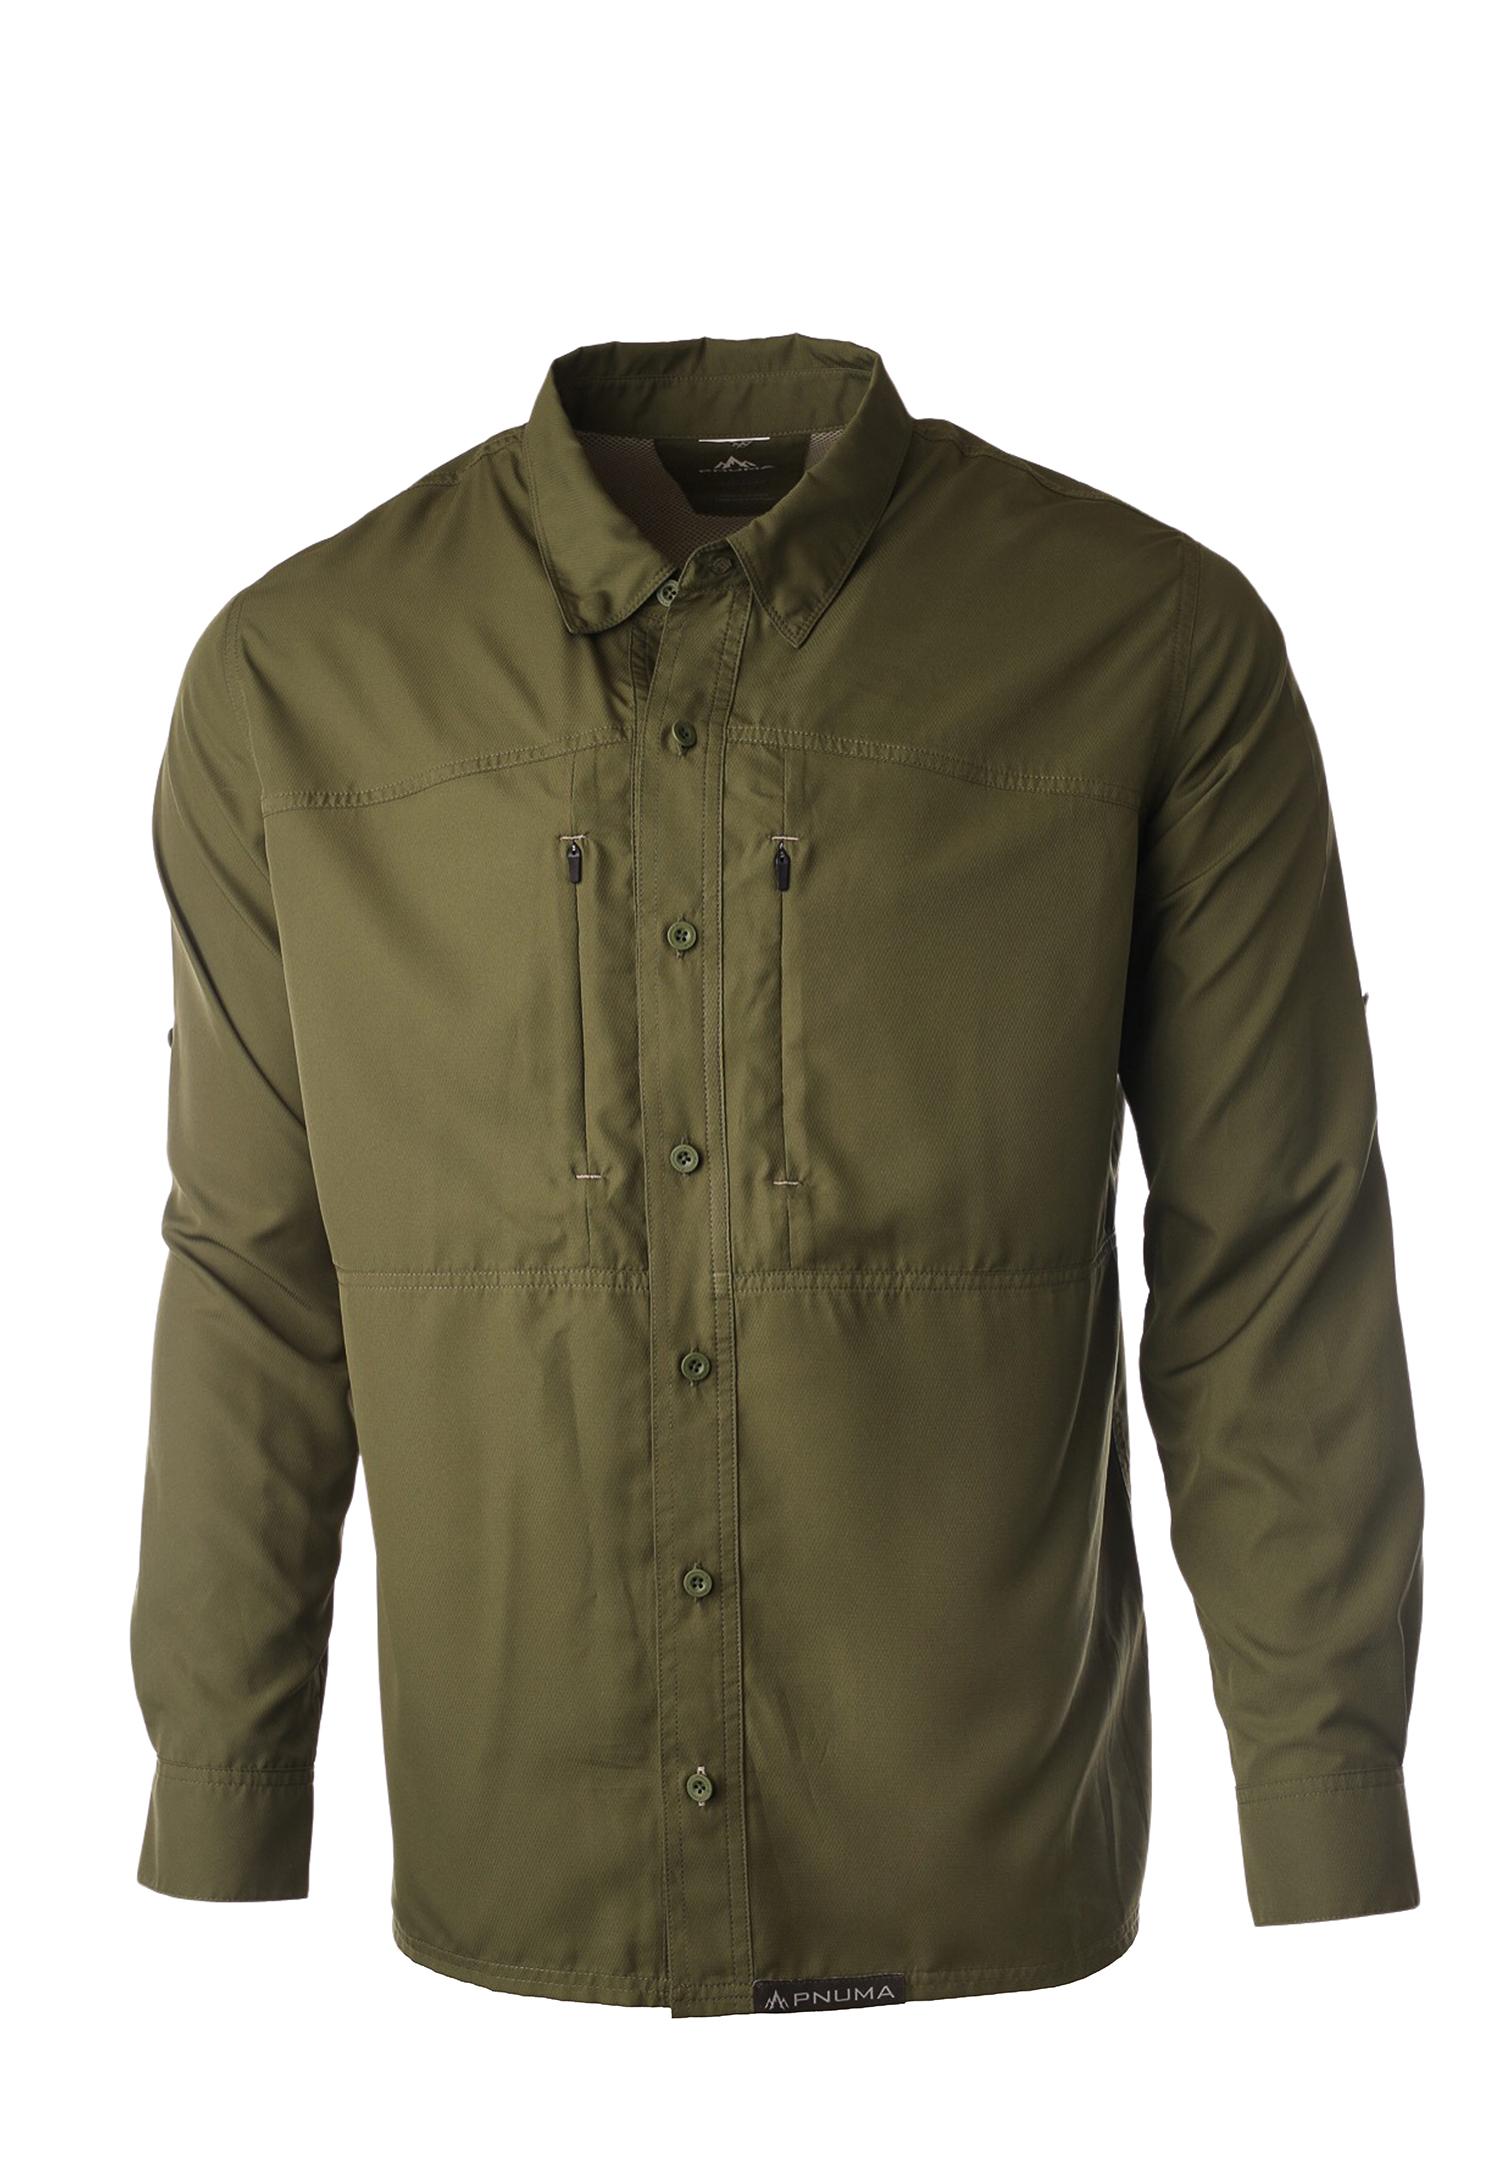 Shooting Shirt - Long Sleeve